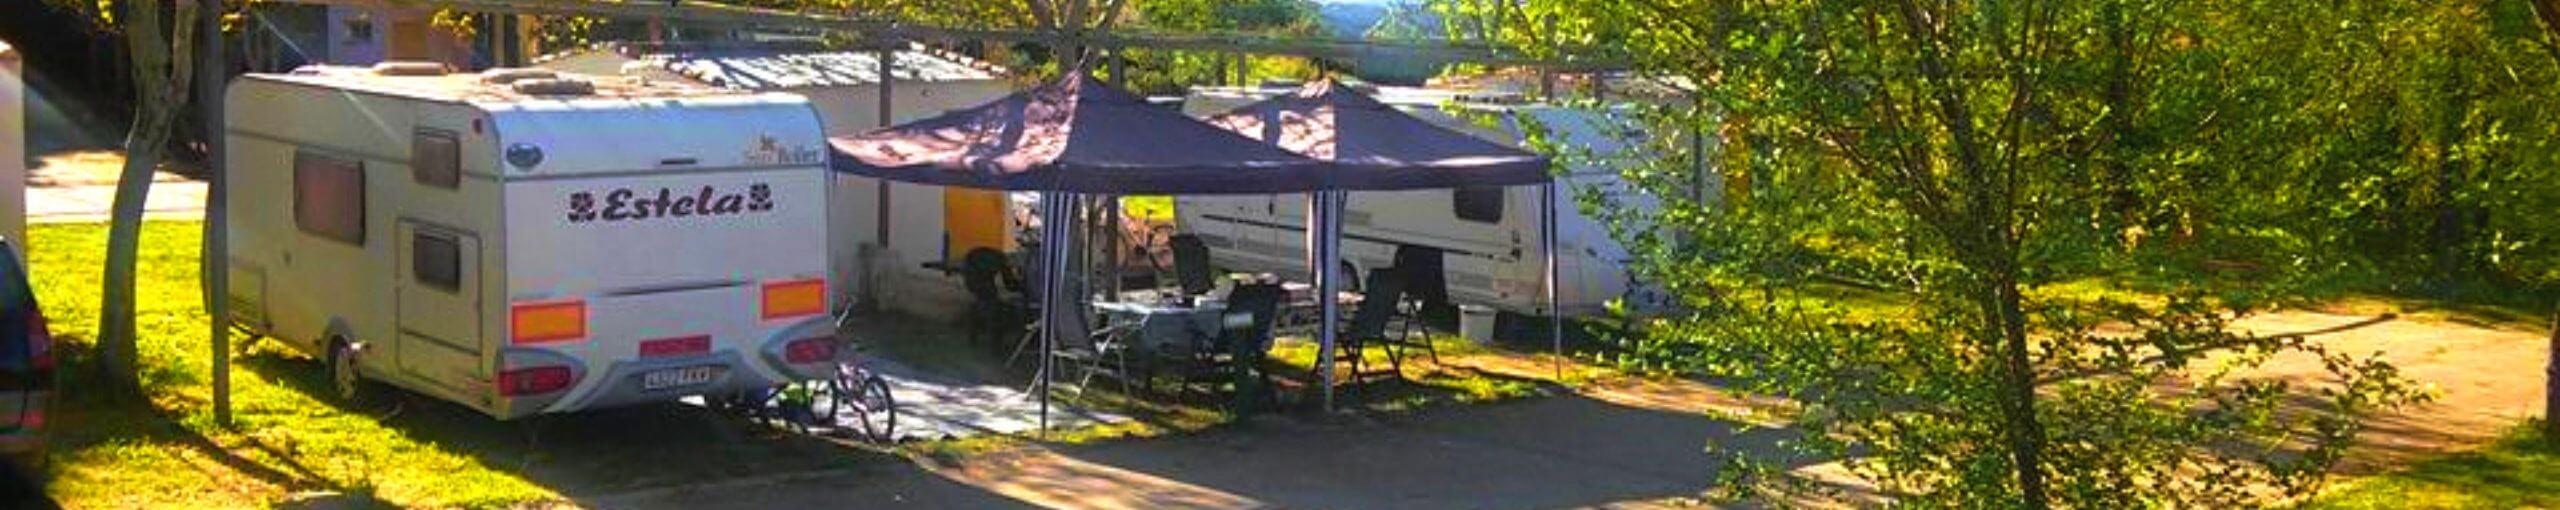 Camping Navahermosa. Toledo, Castilla La Mancha.